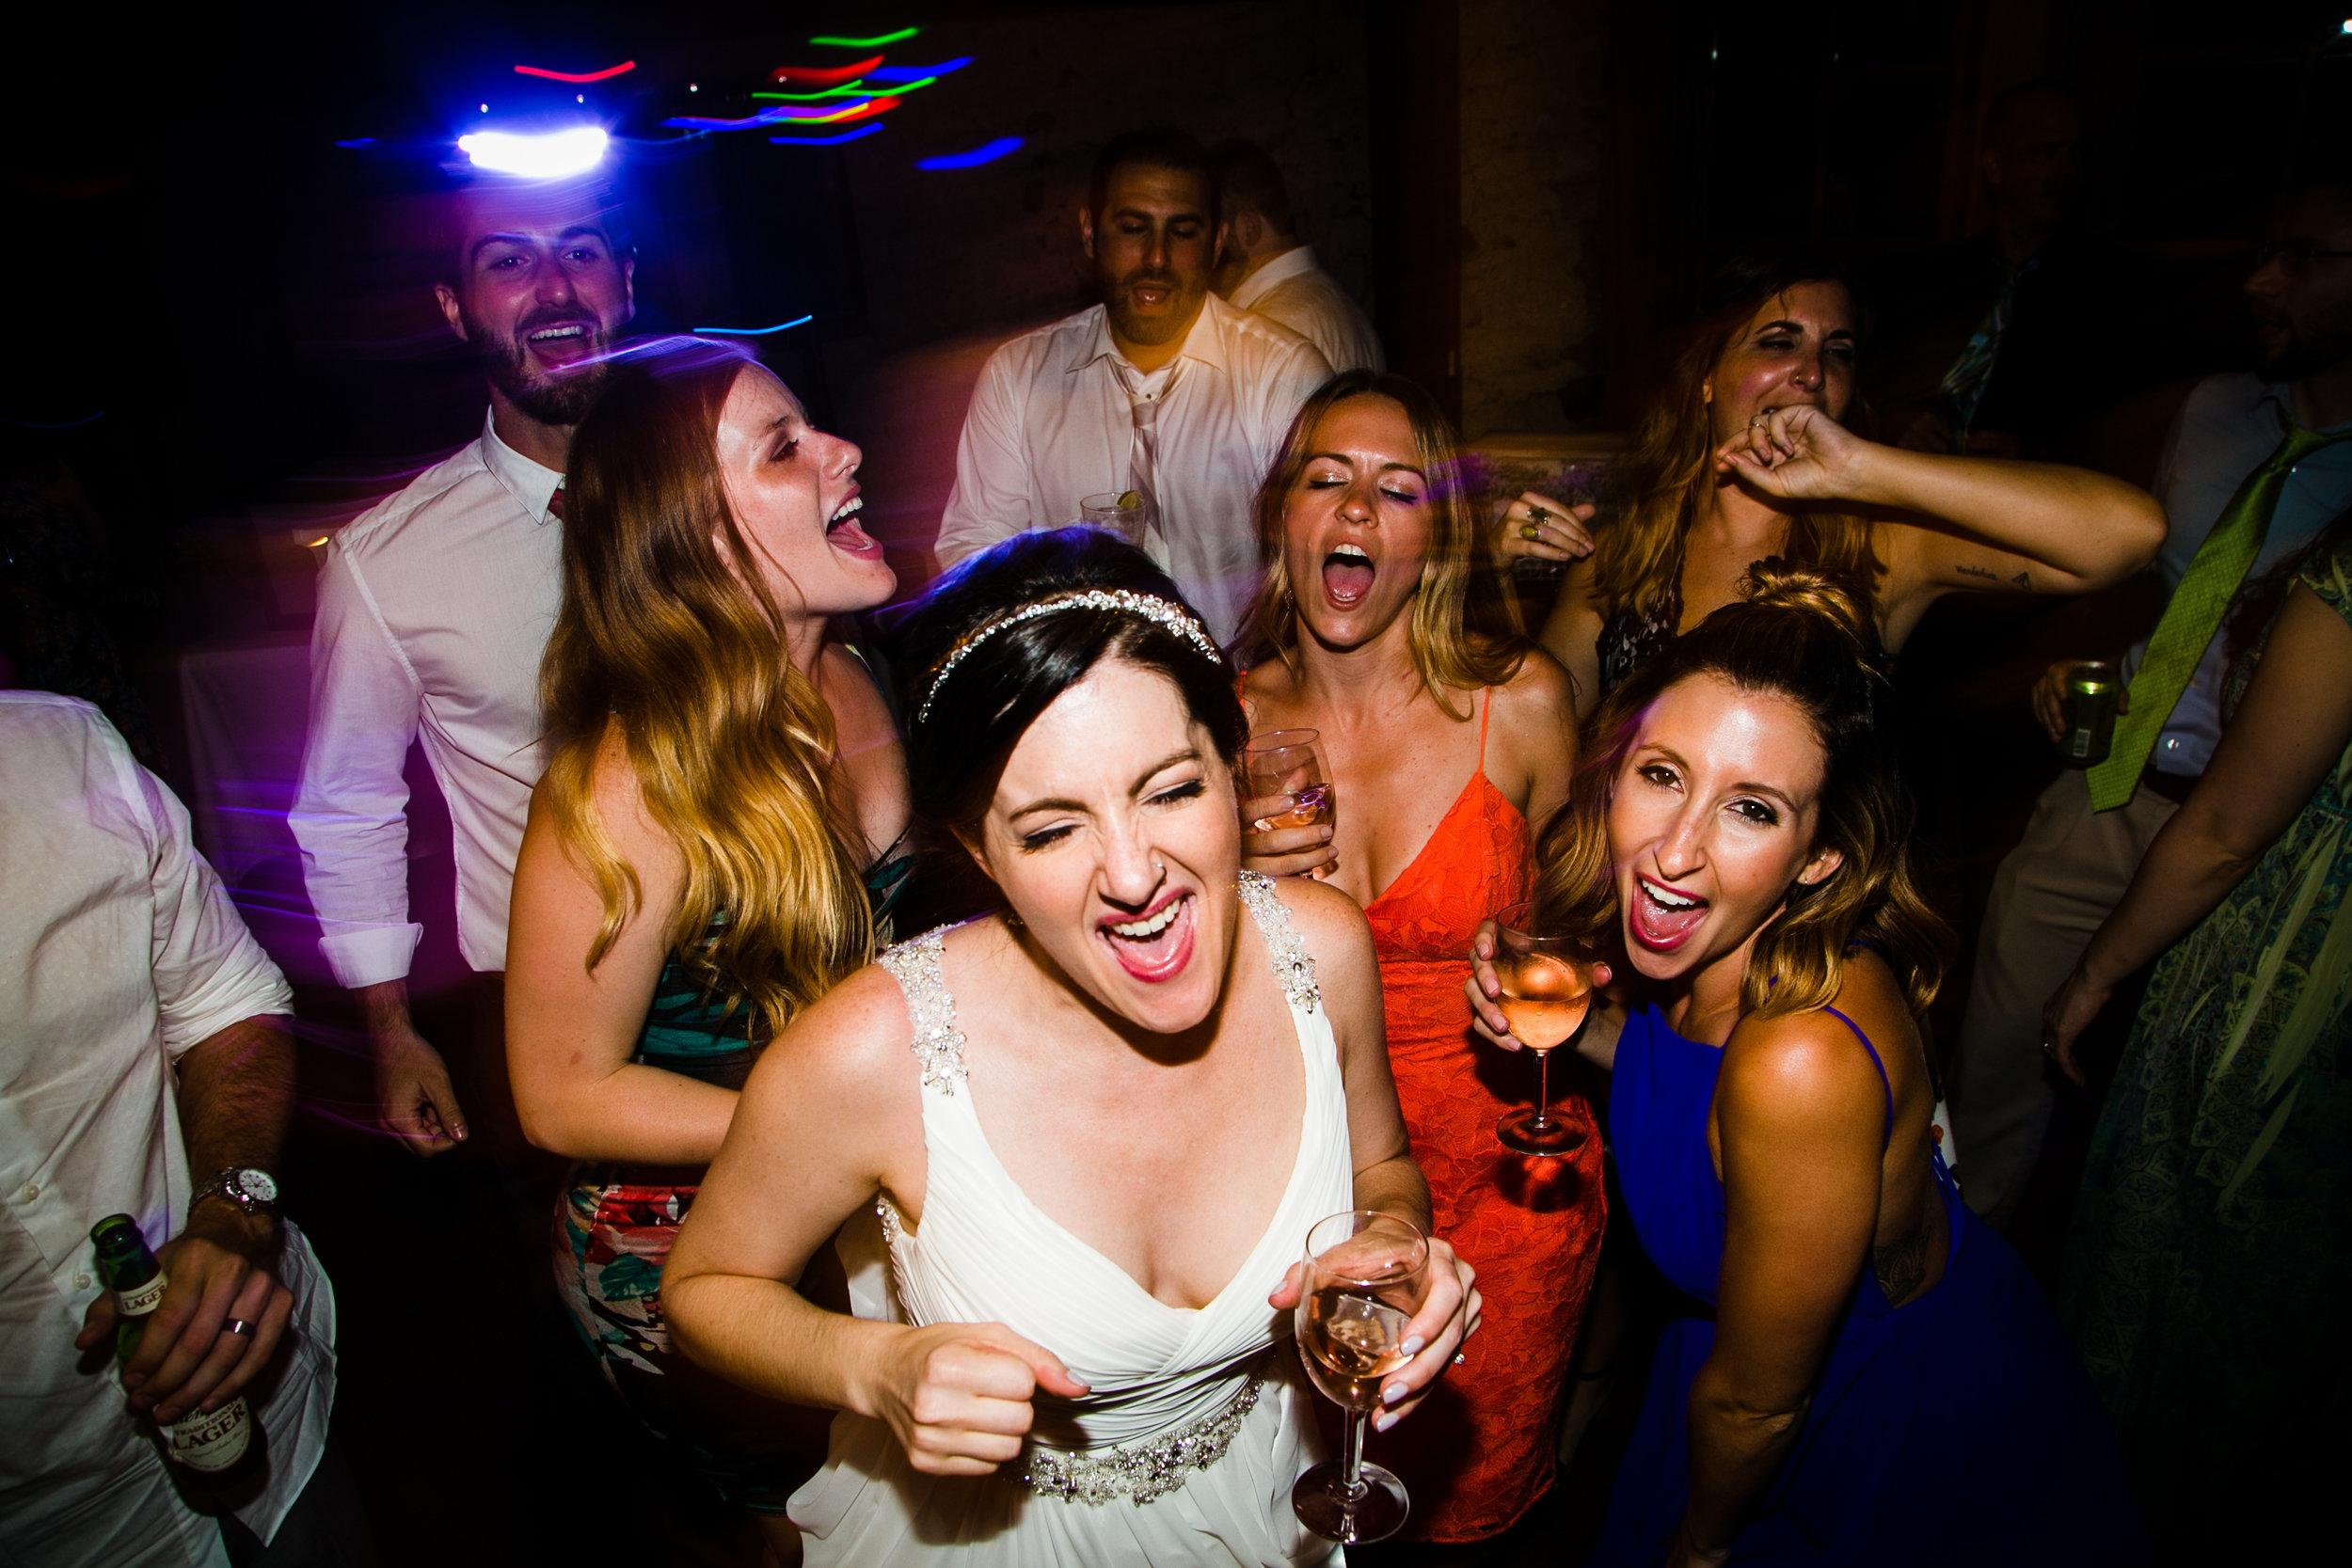 TYLER ARBORETUM WEDDING PHOTOGRAPHY LOVESTRUCK PICTURES-095.jpg